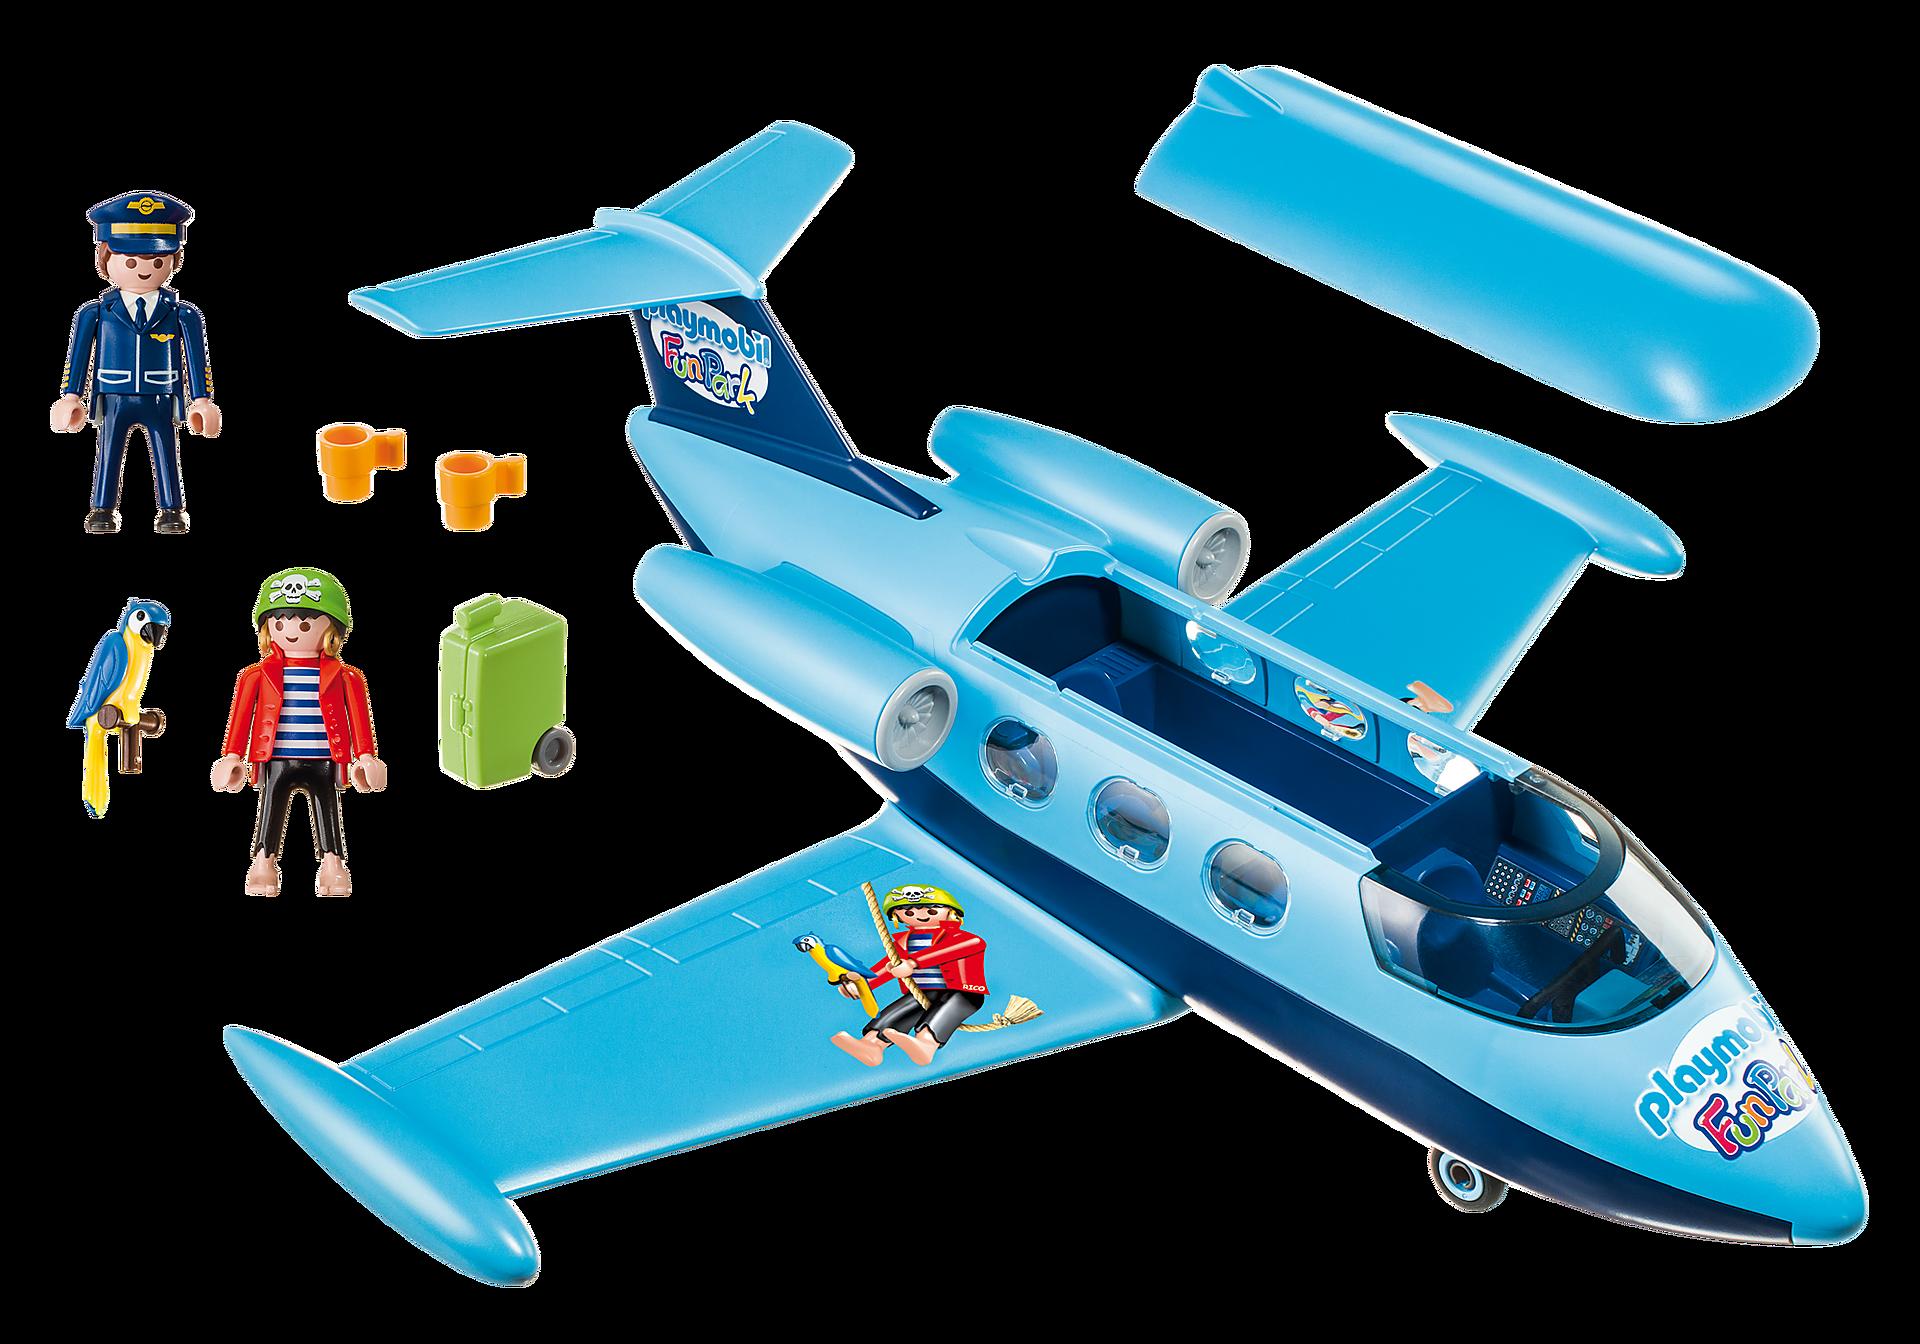 9366 PLAYMOBIL-FunPark Summer Jet zoom image3